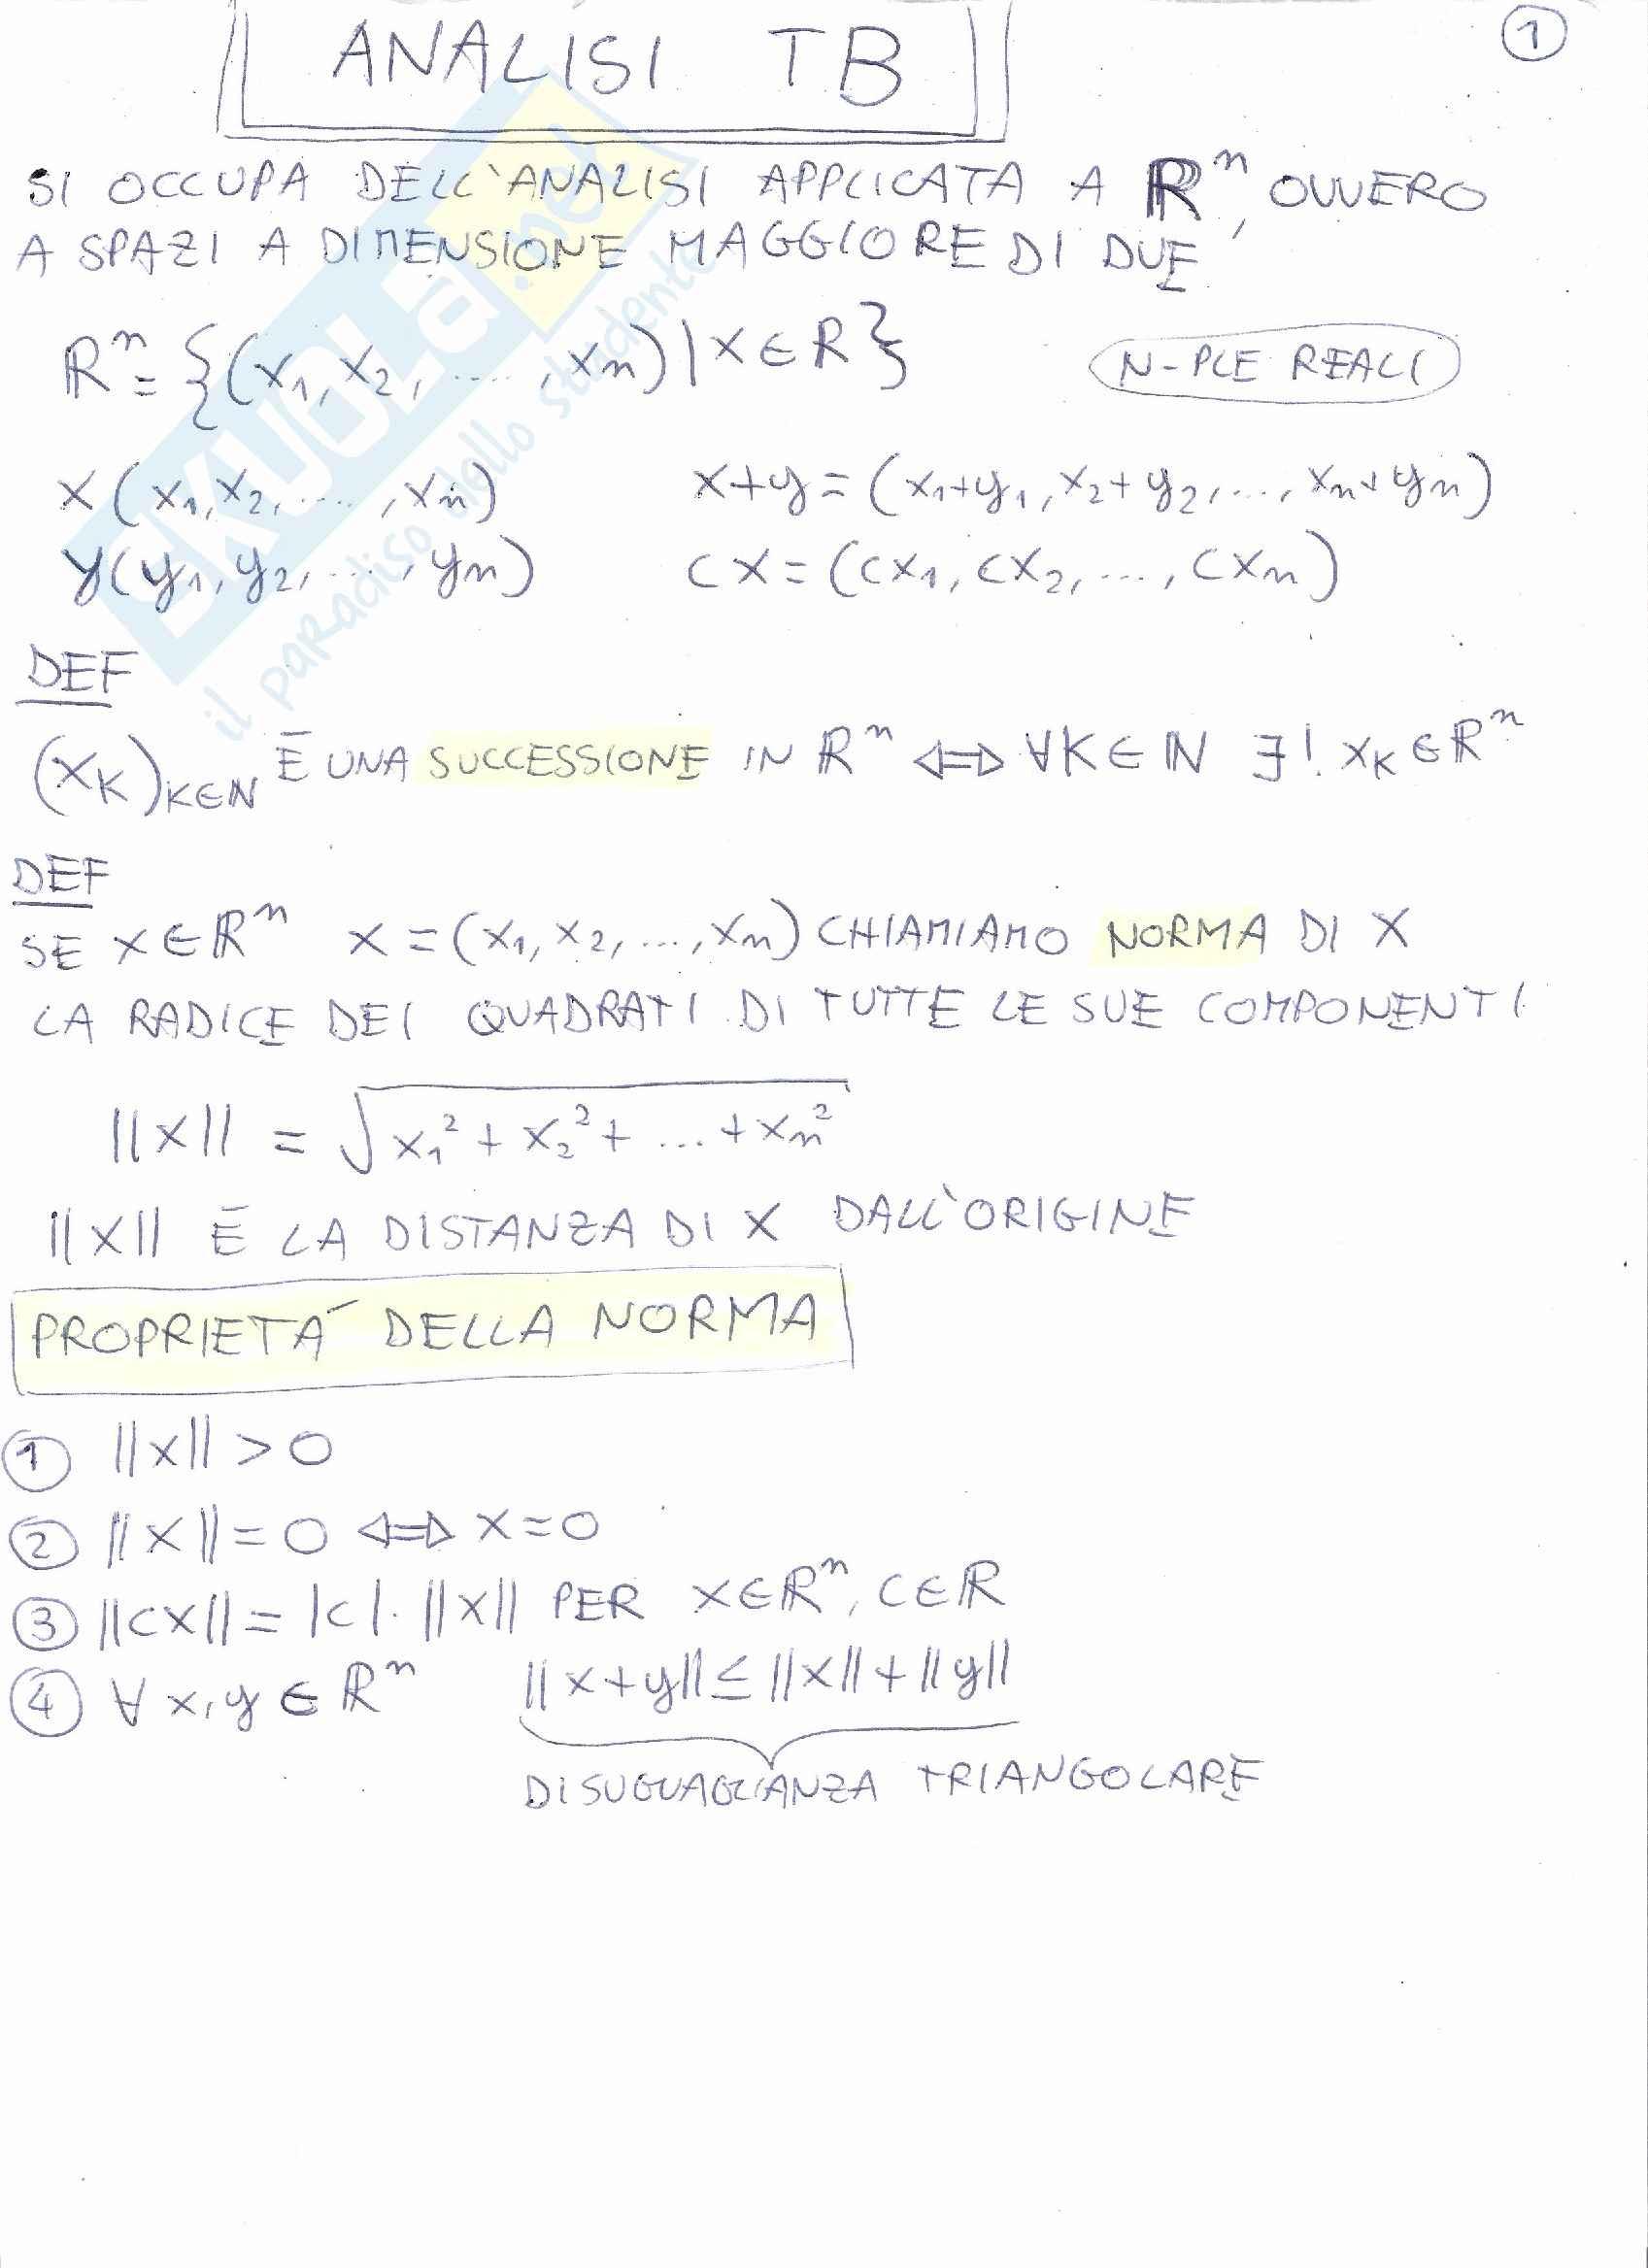 Analisi Matematica - Appunti ed esercizi